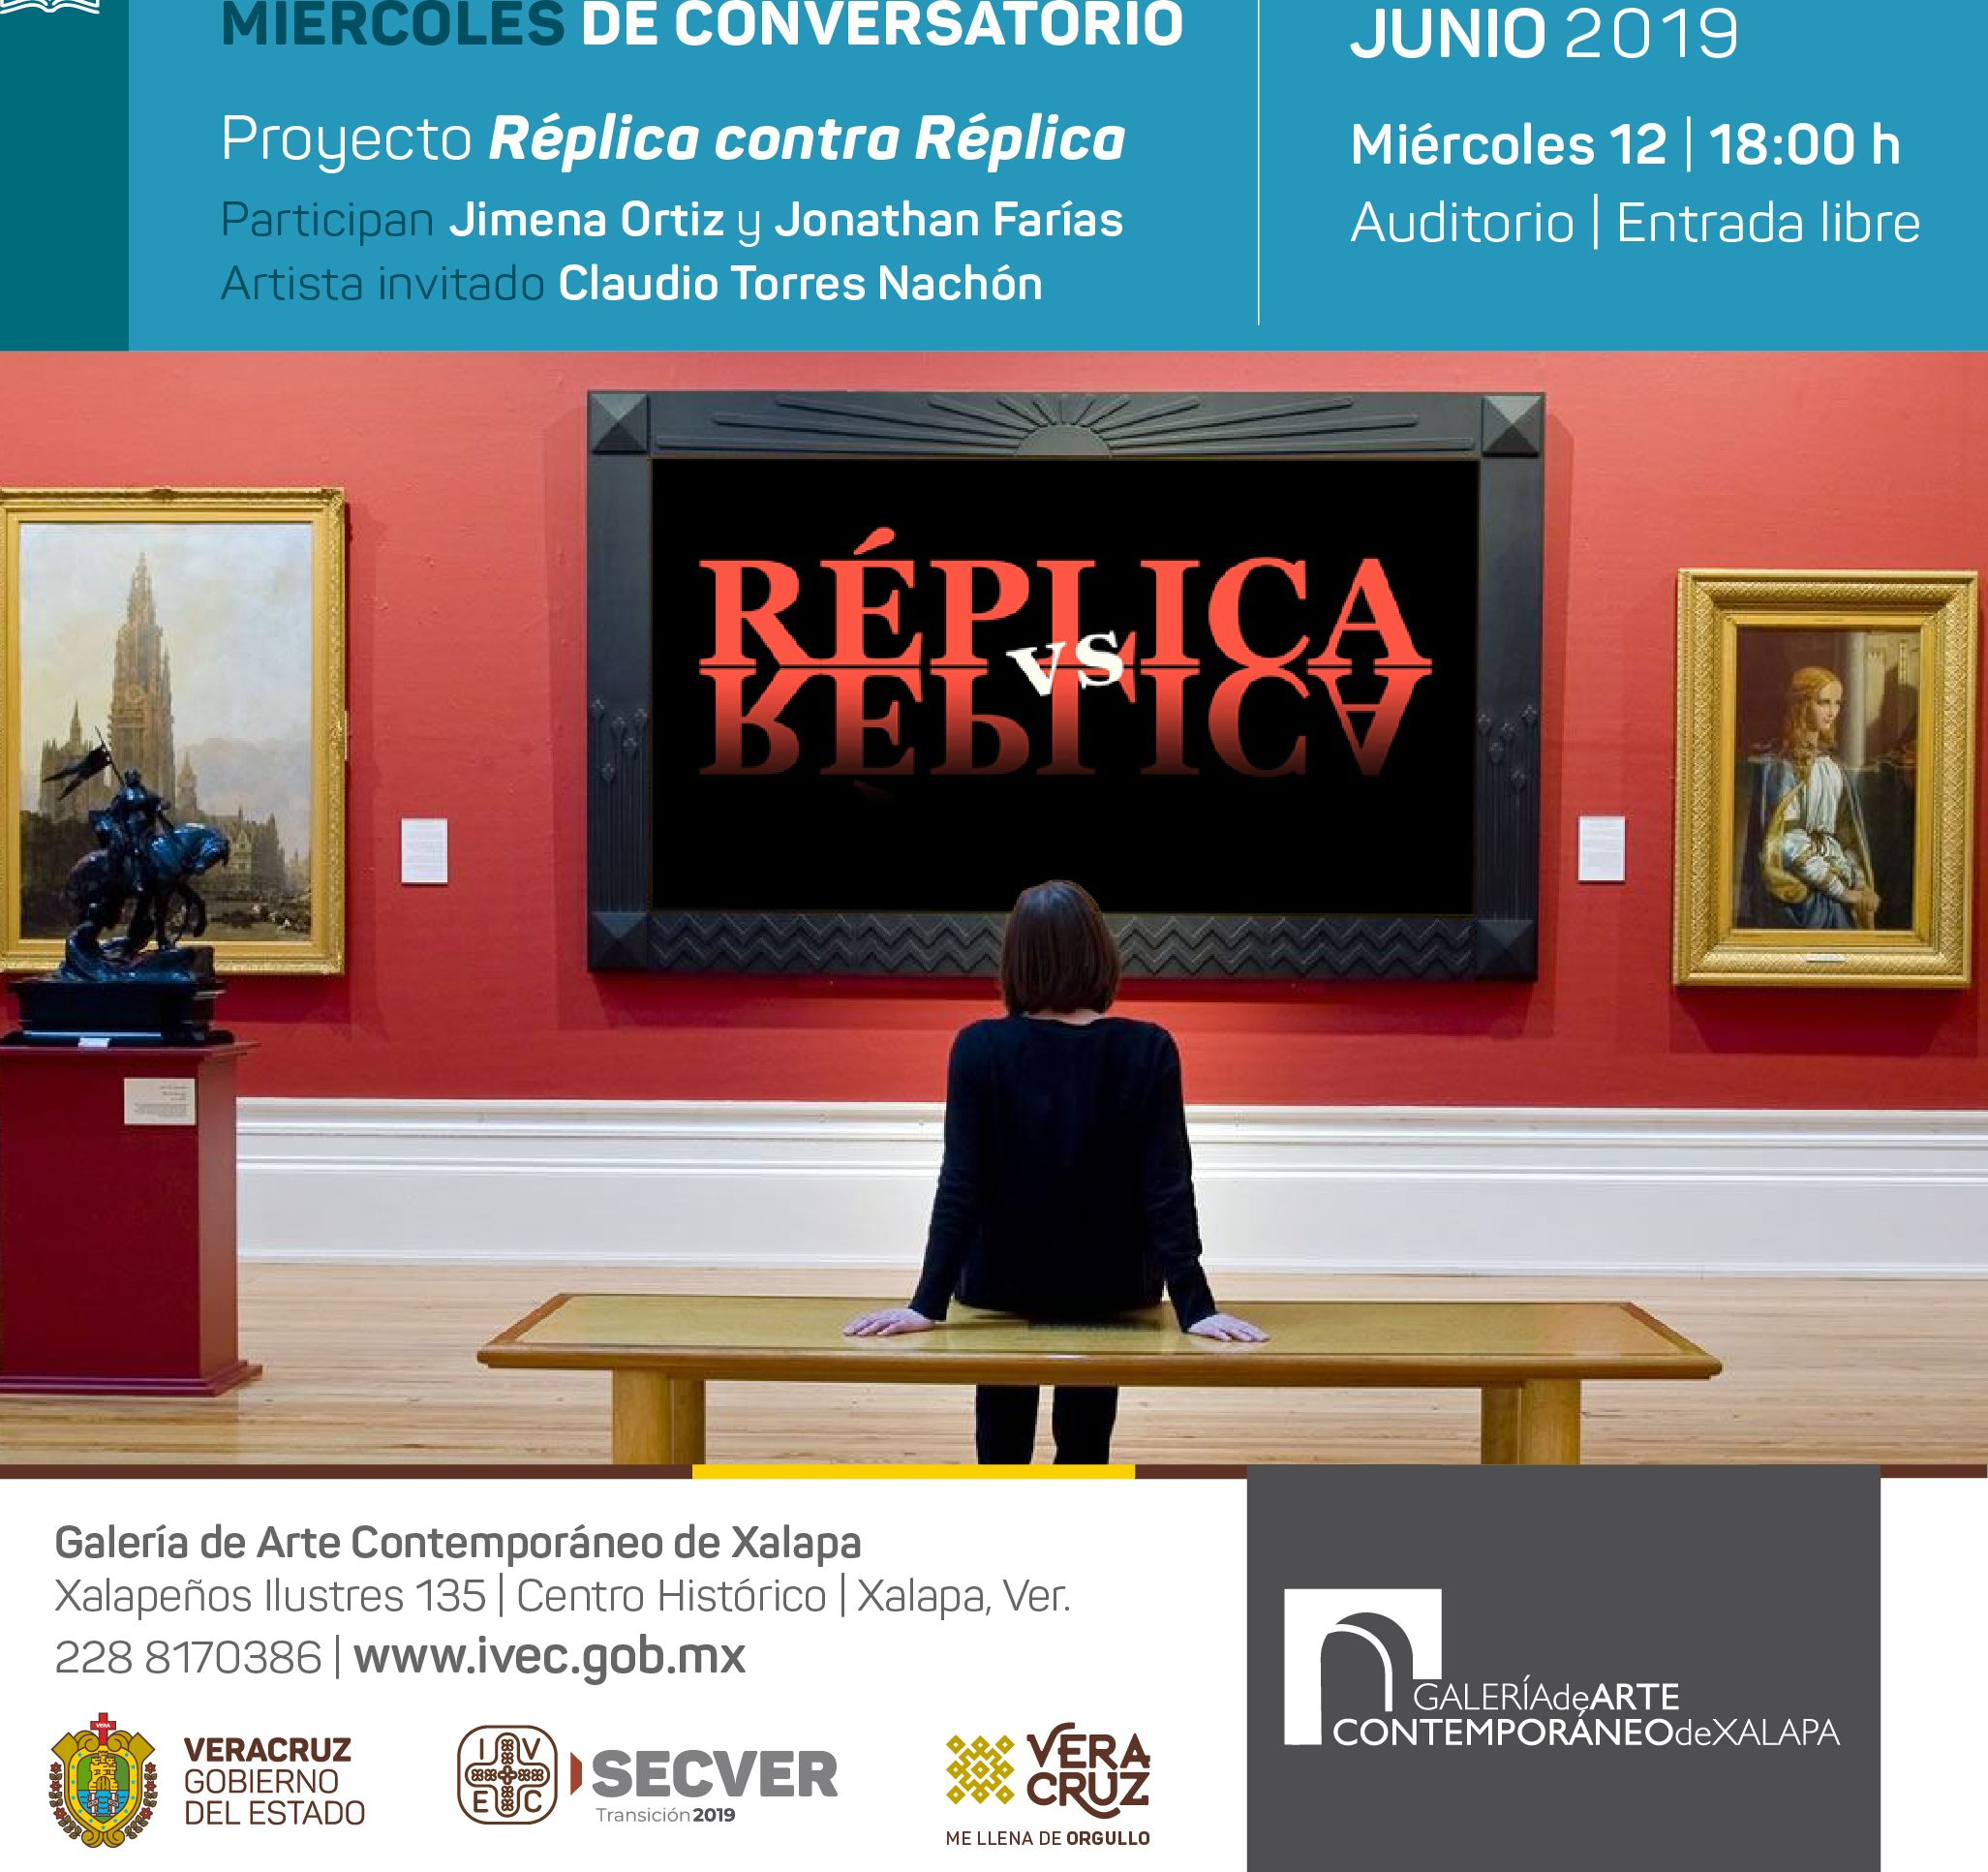 Miércoles de conversatorio en Casa de la Cultura Coatepec y GACX